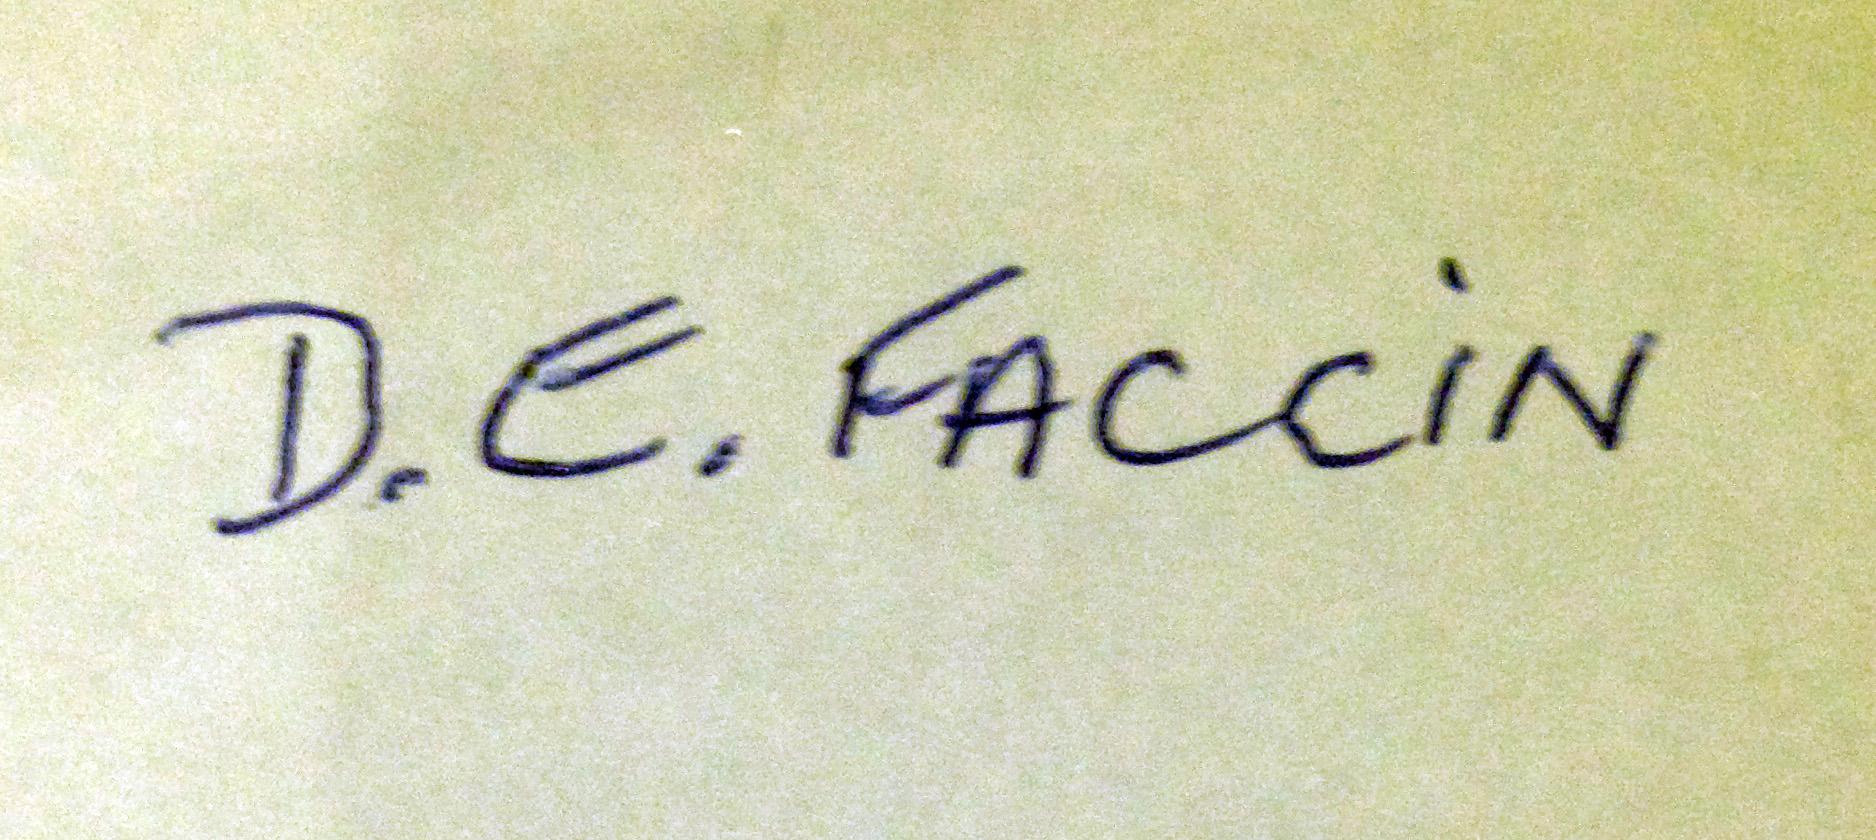 Dianne Faccin's Signature